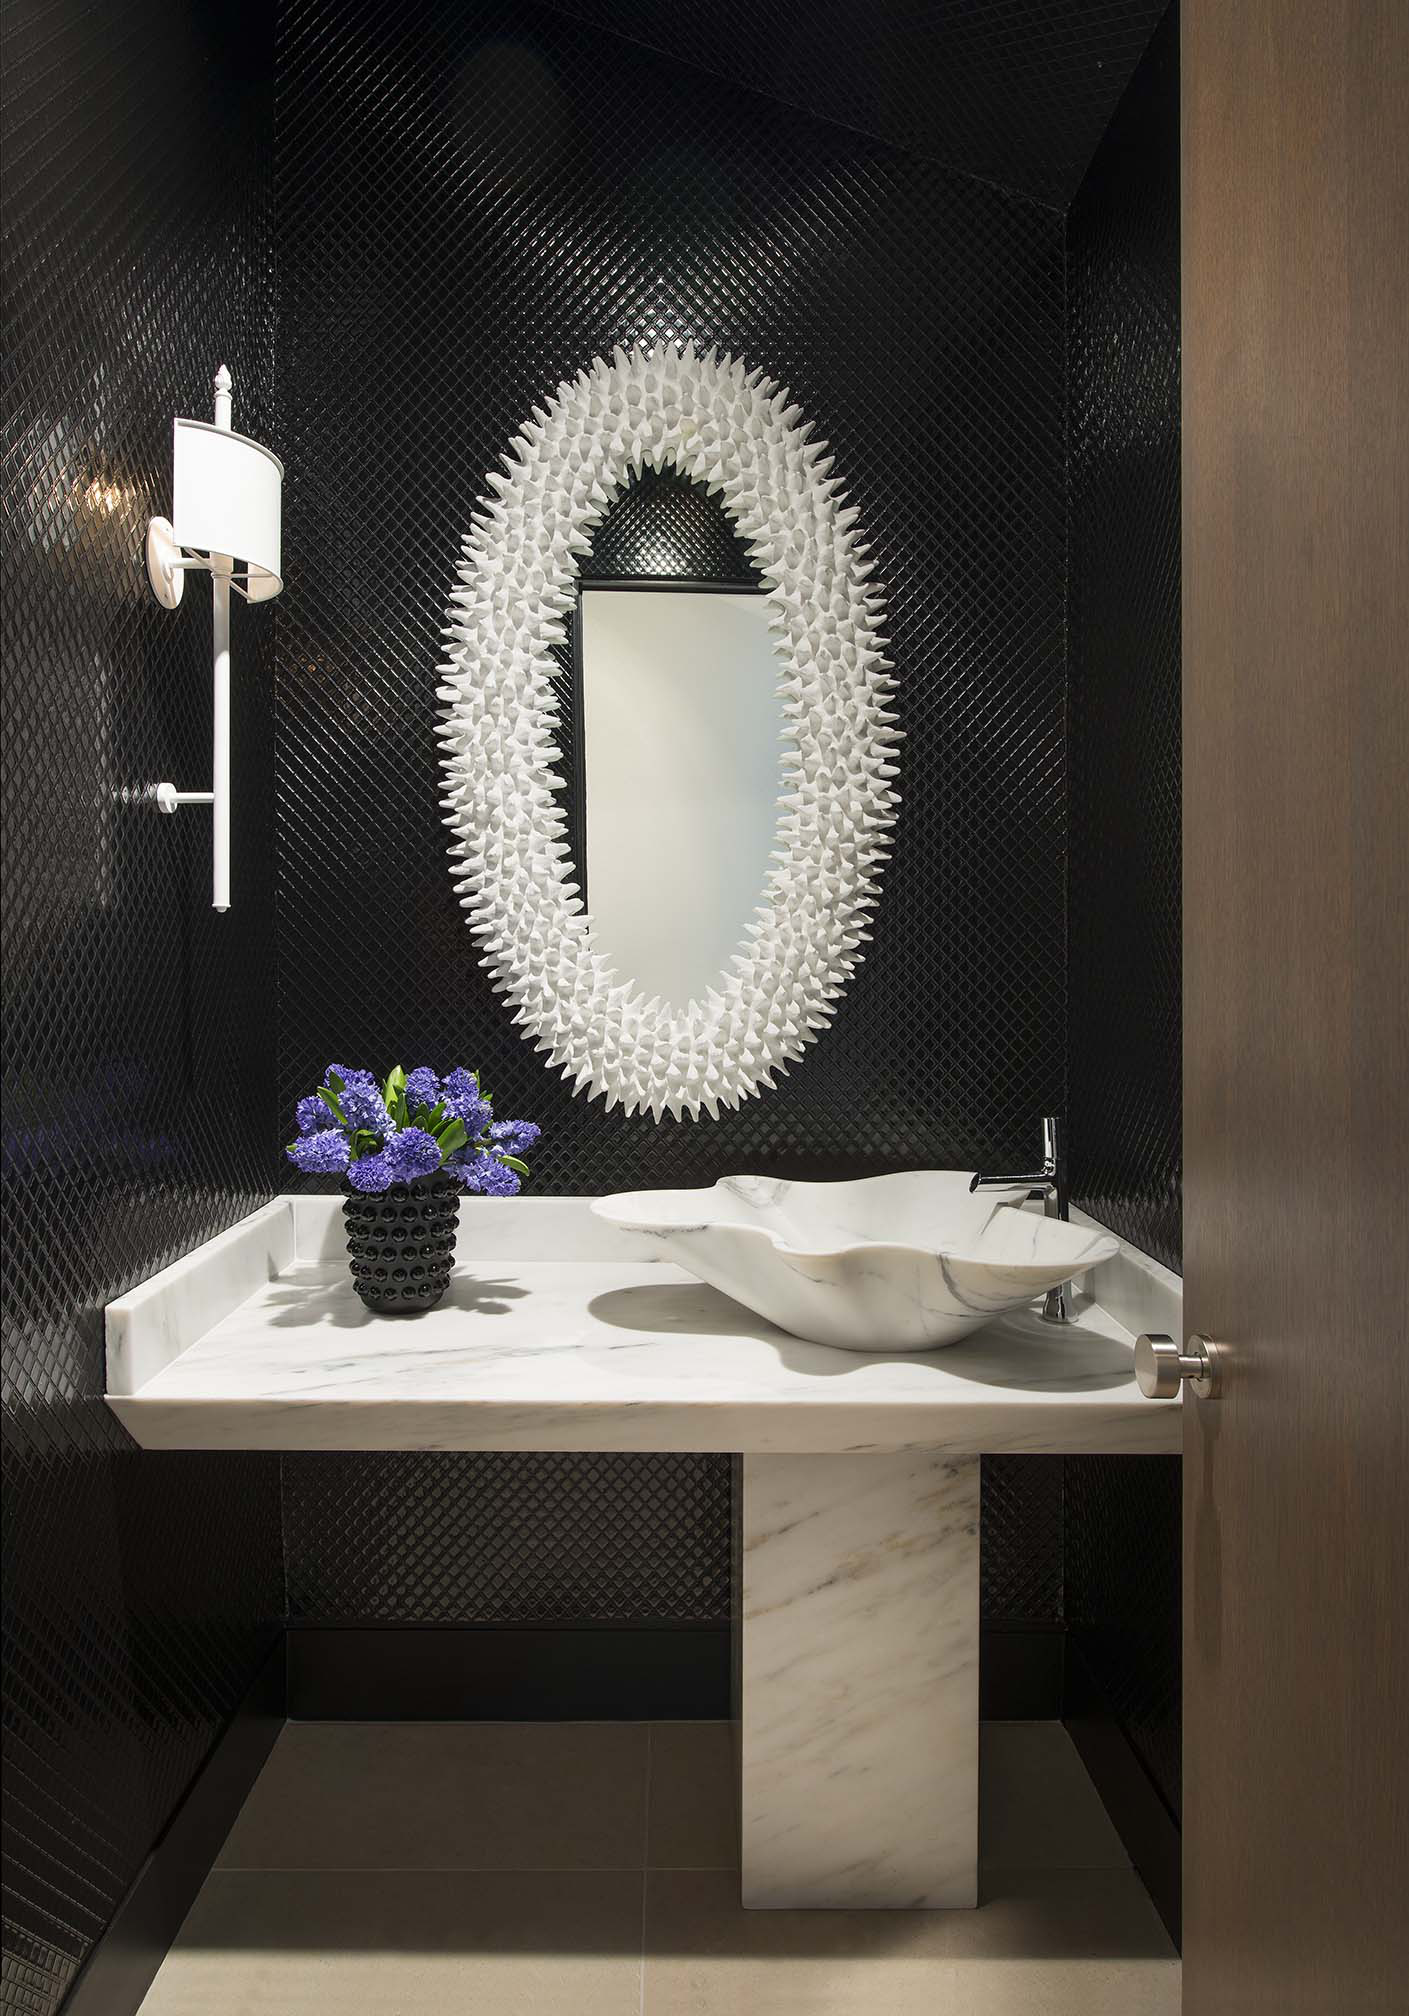 Sleek powder bath with custom marble vanity and sink by Denise McGaha Interiors